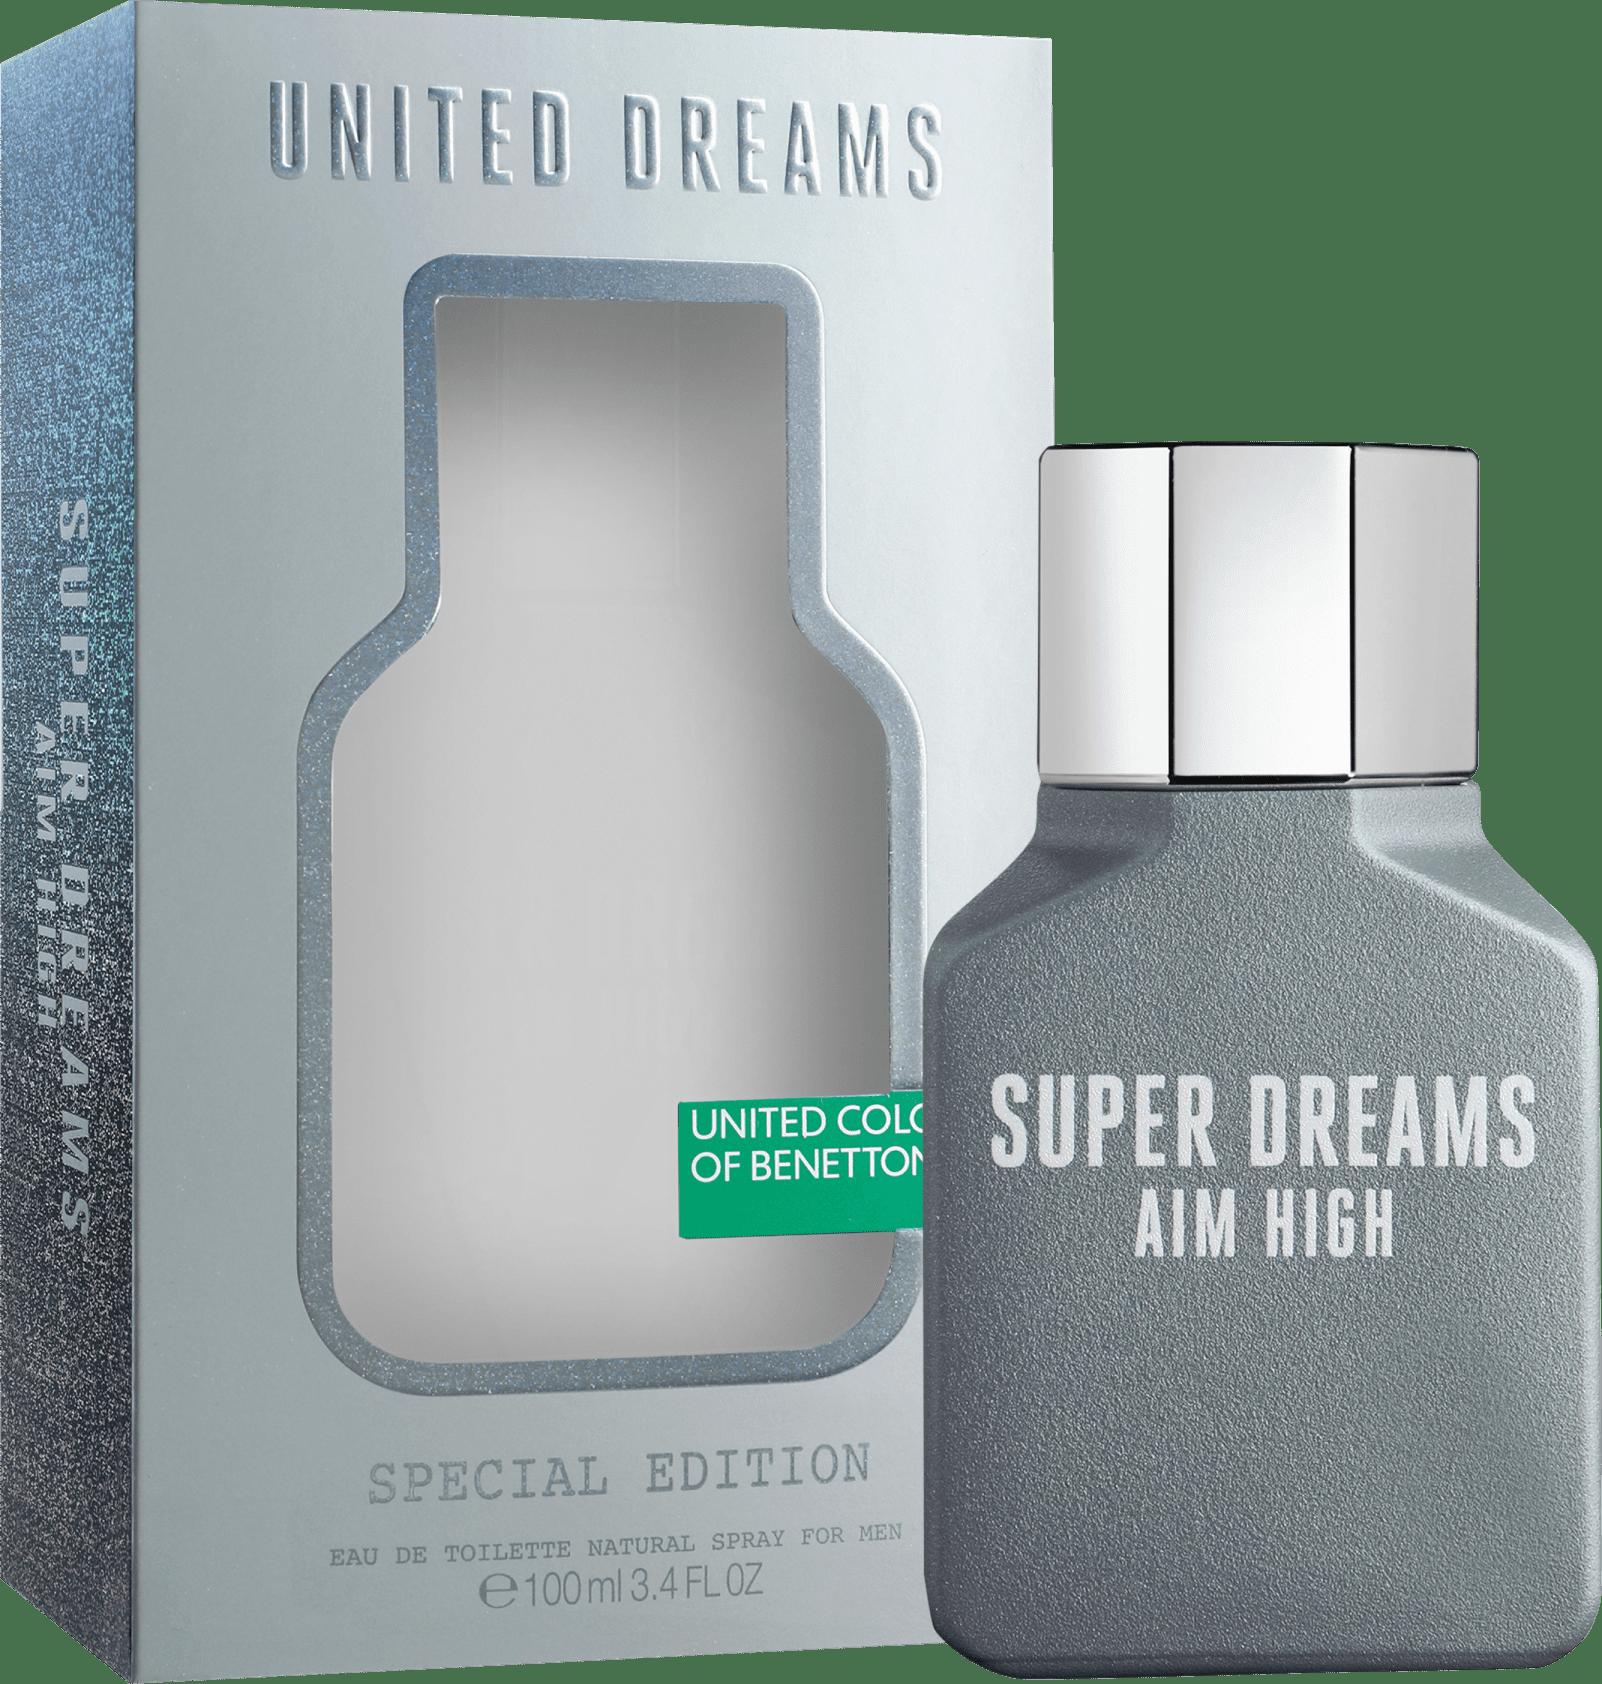 7953a371e United Dreams Super Dreams Aim High Edição Limitada Benetton Eau de Toilette  - Perfume Masculino 100ml